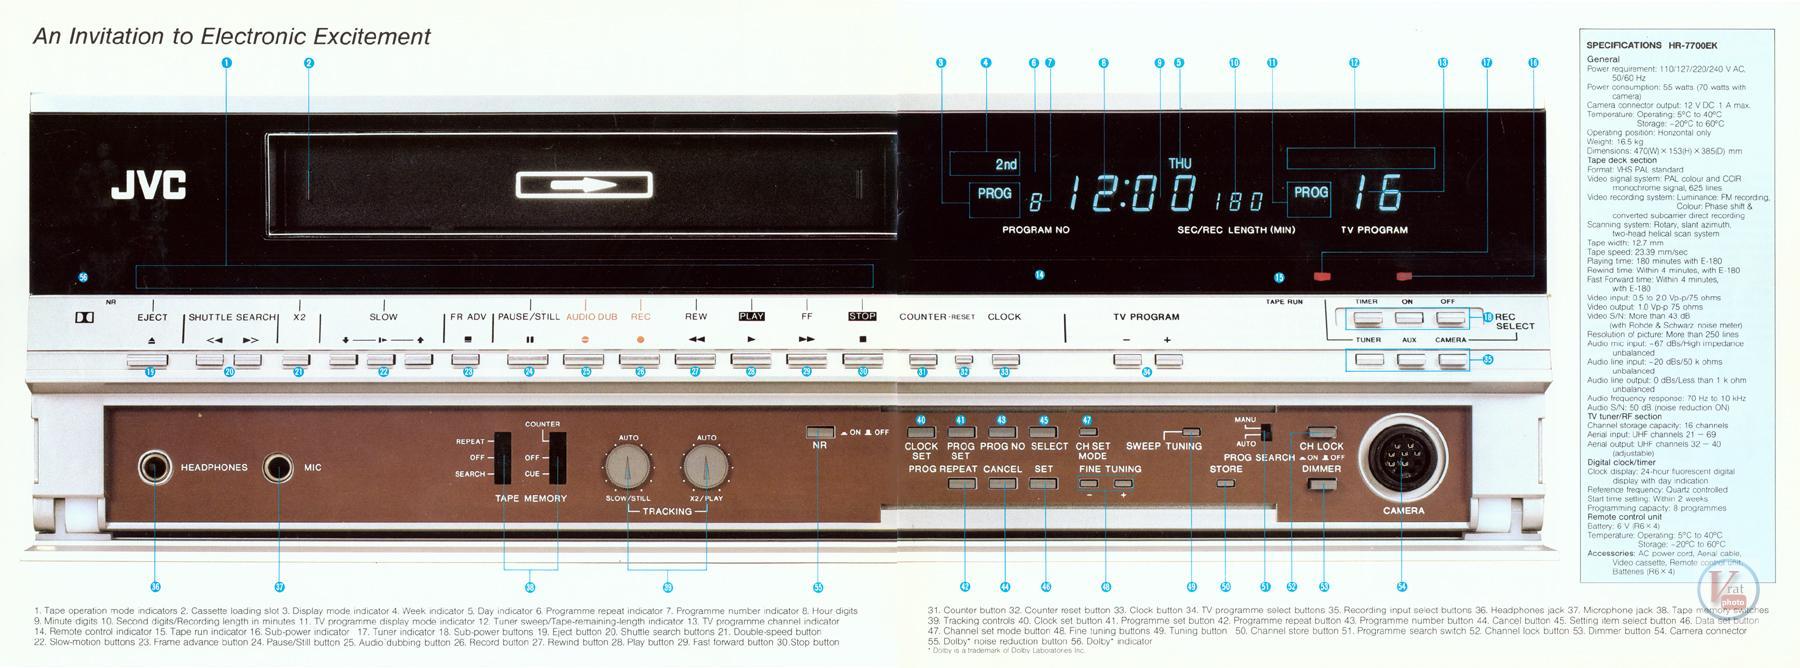 JVC Video Recorders 38